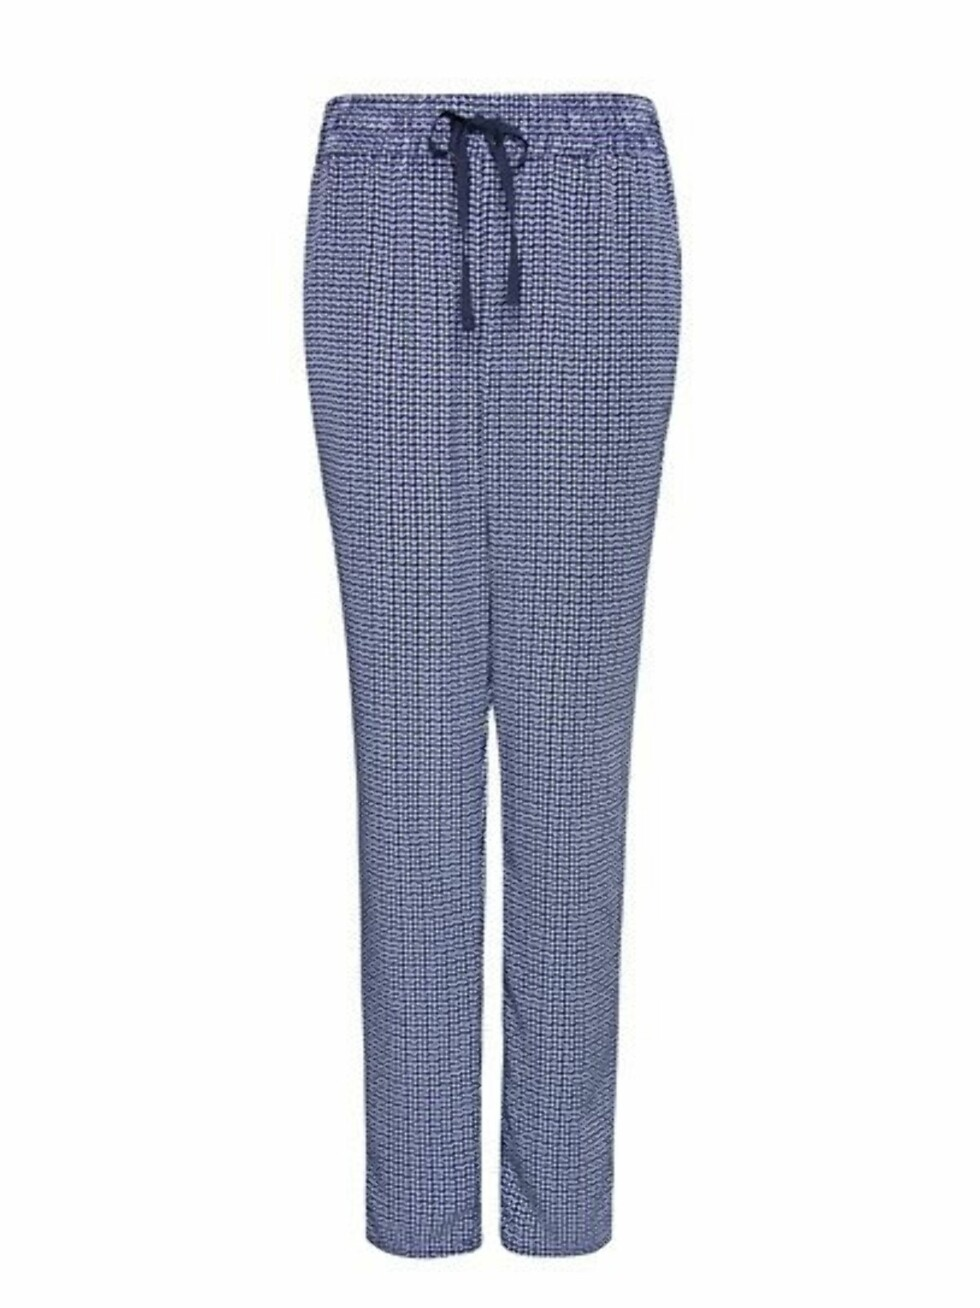 Bukse (kr 350, Mango). Foto: Produsenten